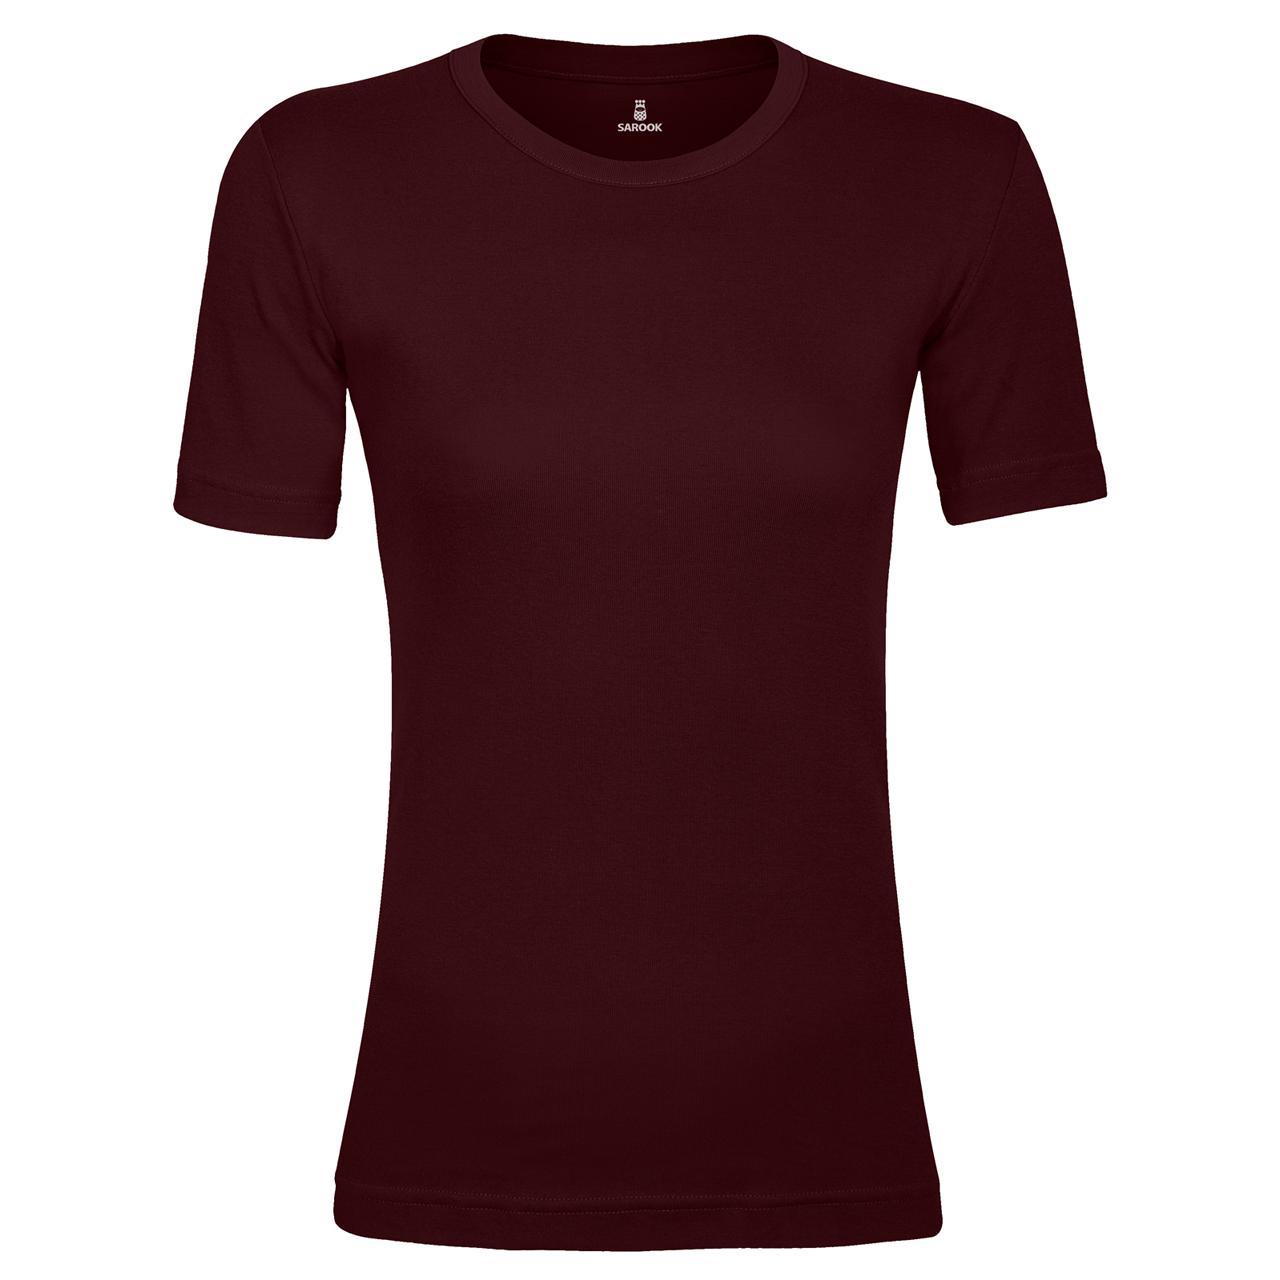 تصویر تی شرت زنانه ساروک مدل U8 رنگ زرشکی